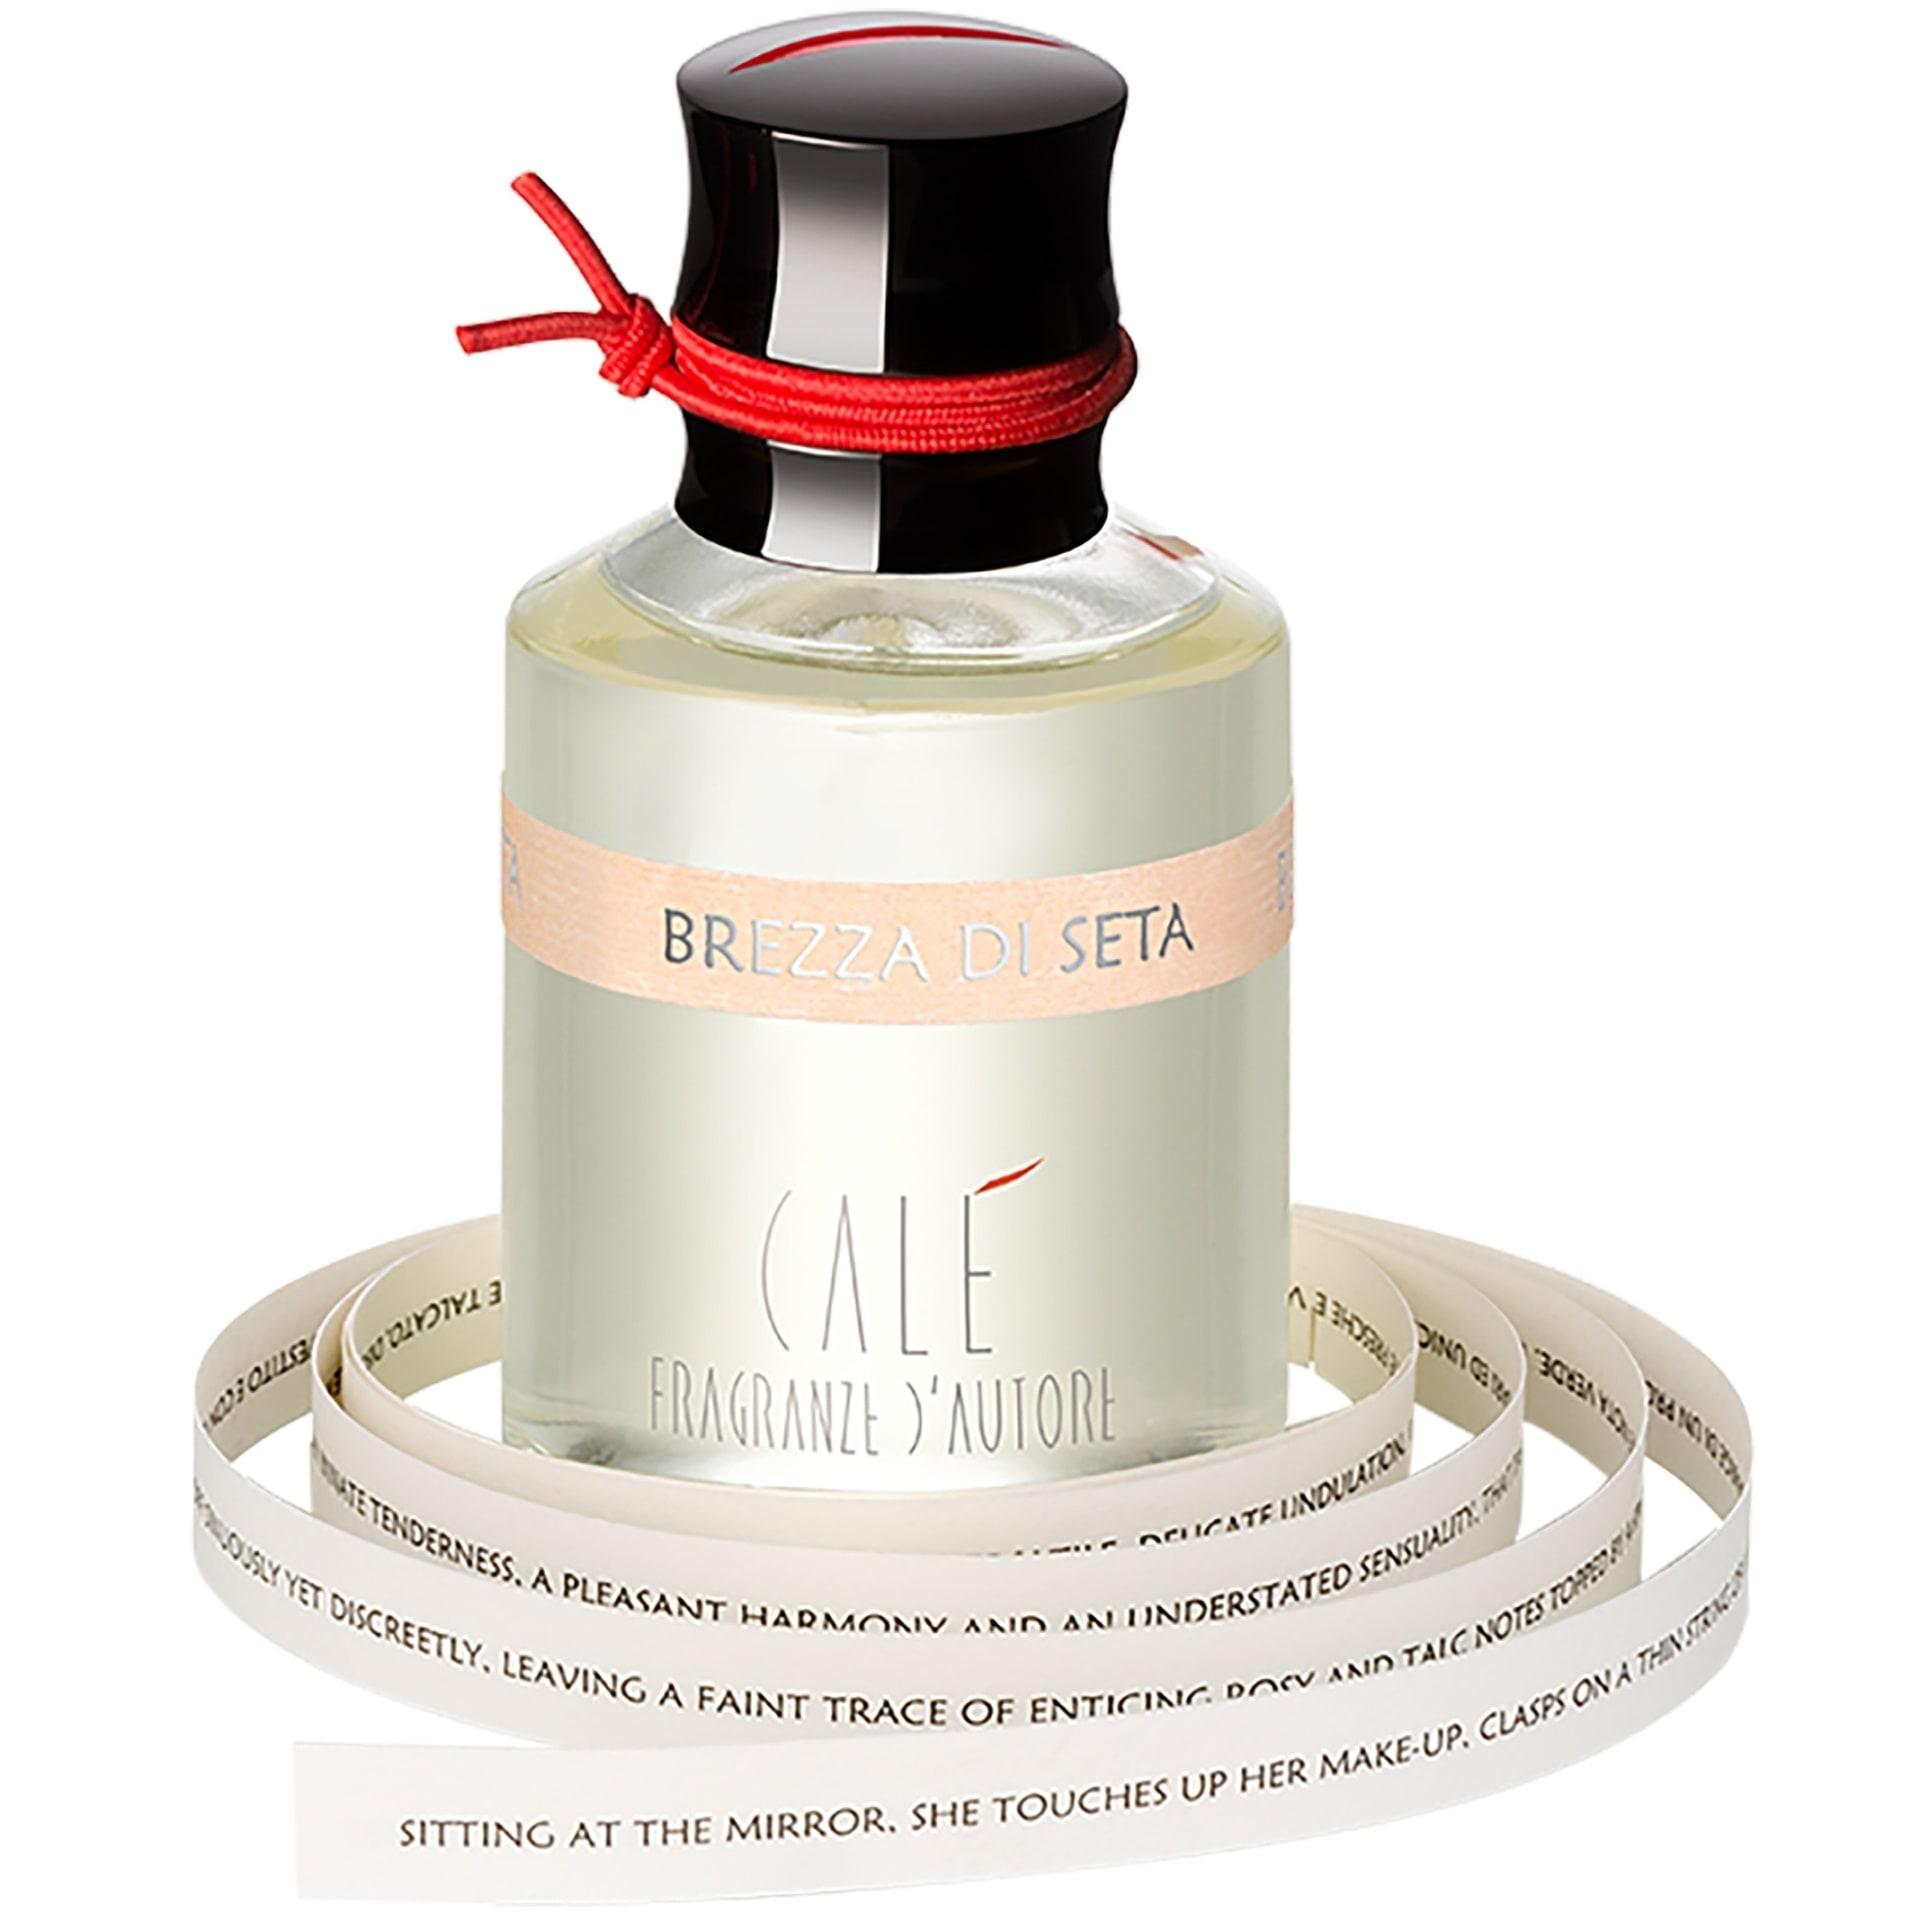 cale-fragranze-dautore-brezza-di-seta-3